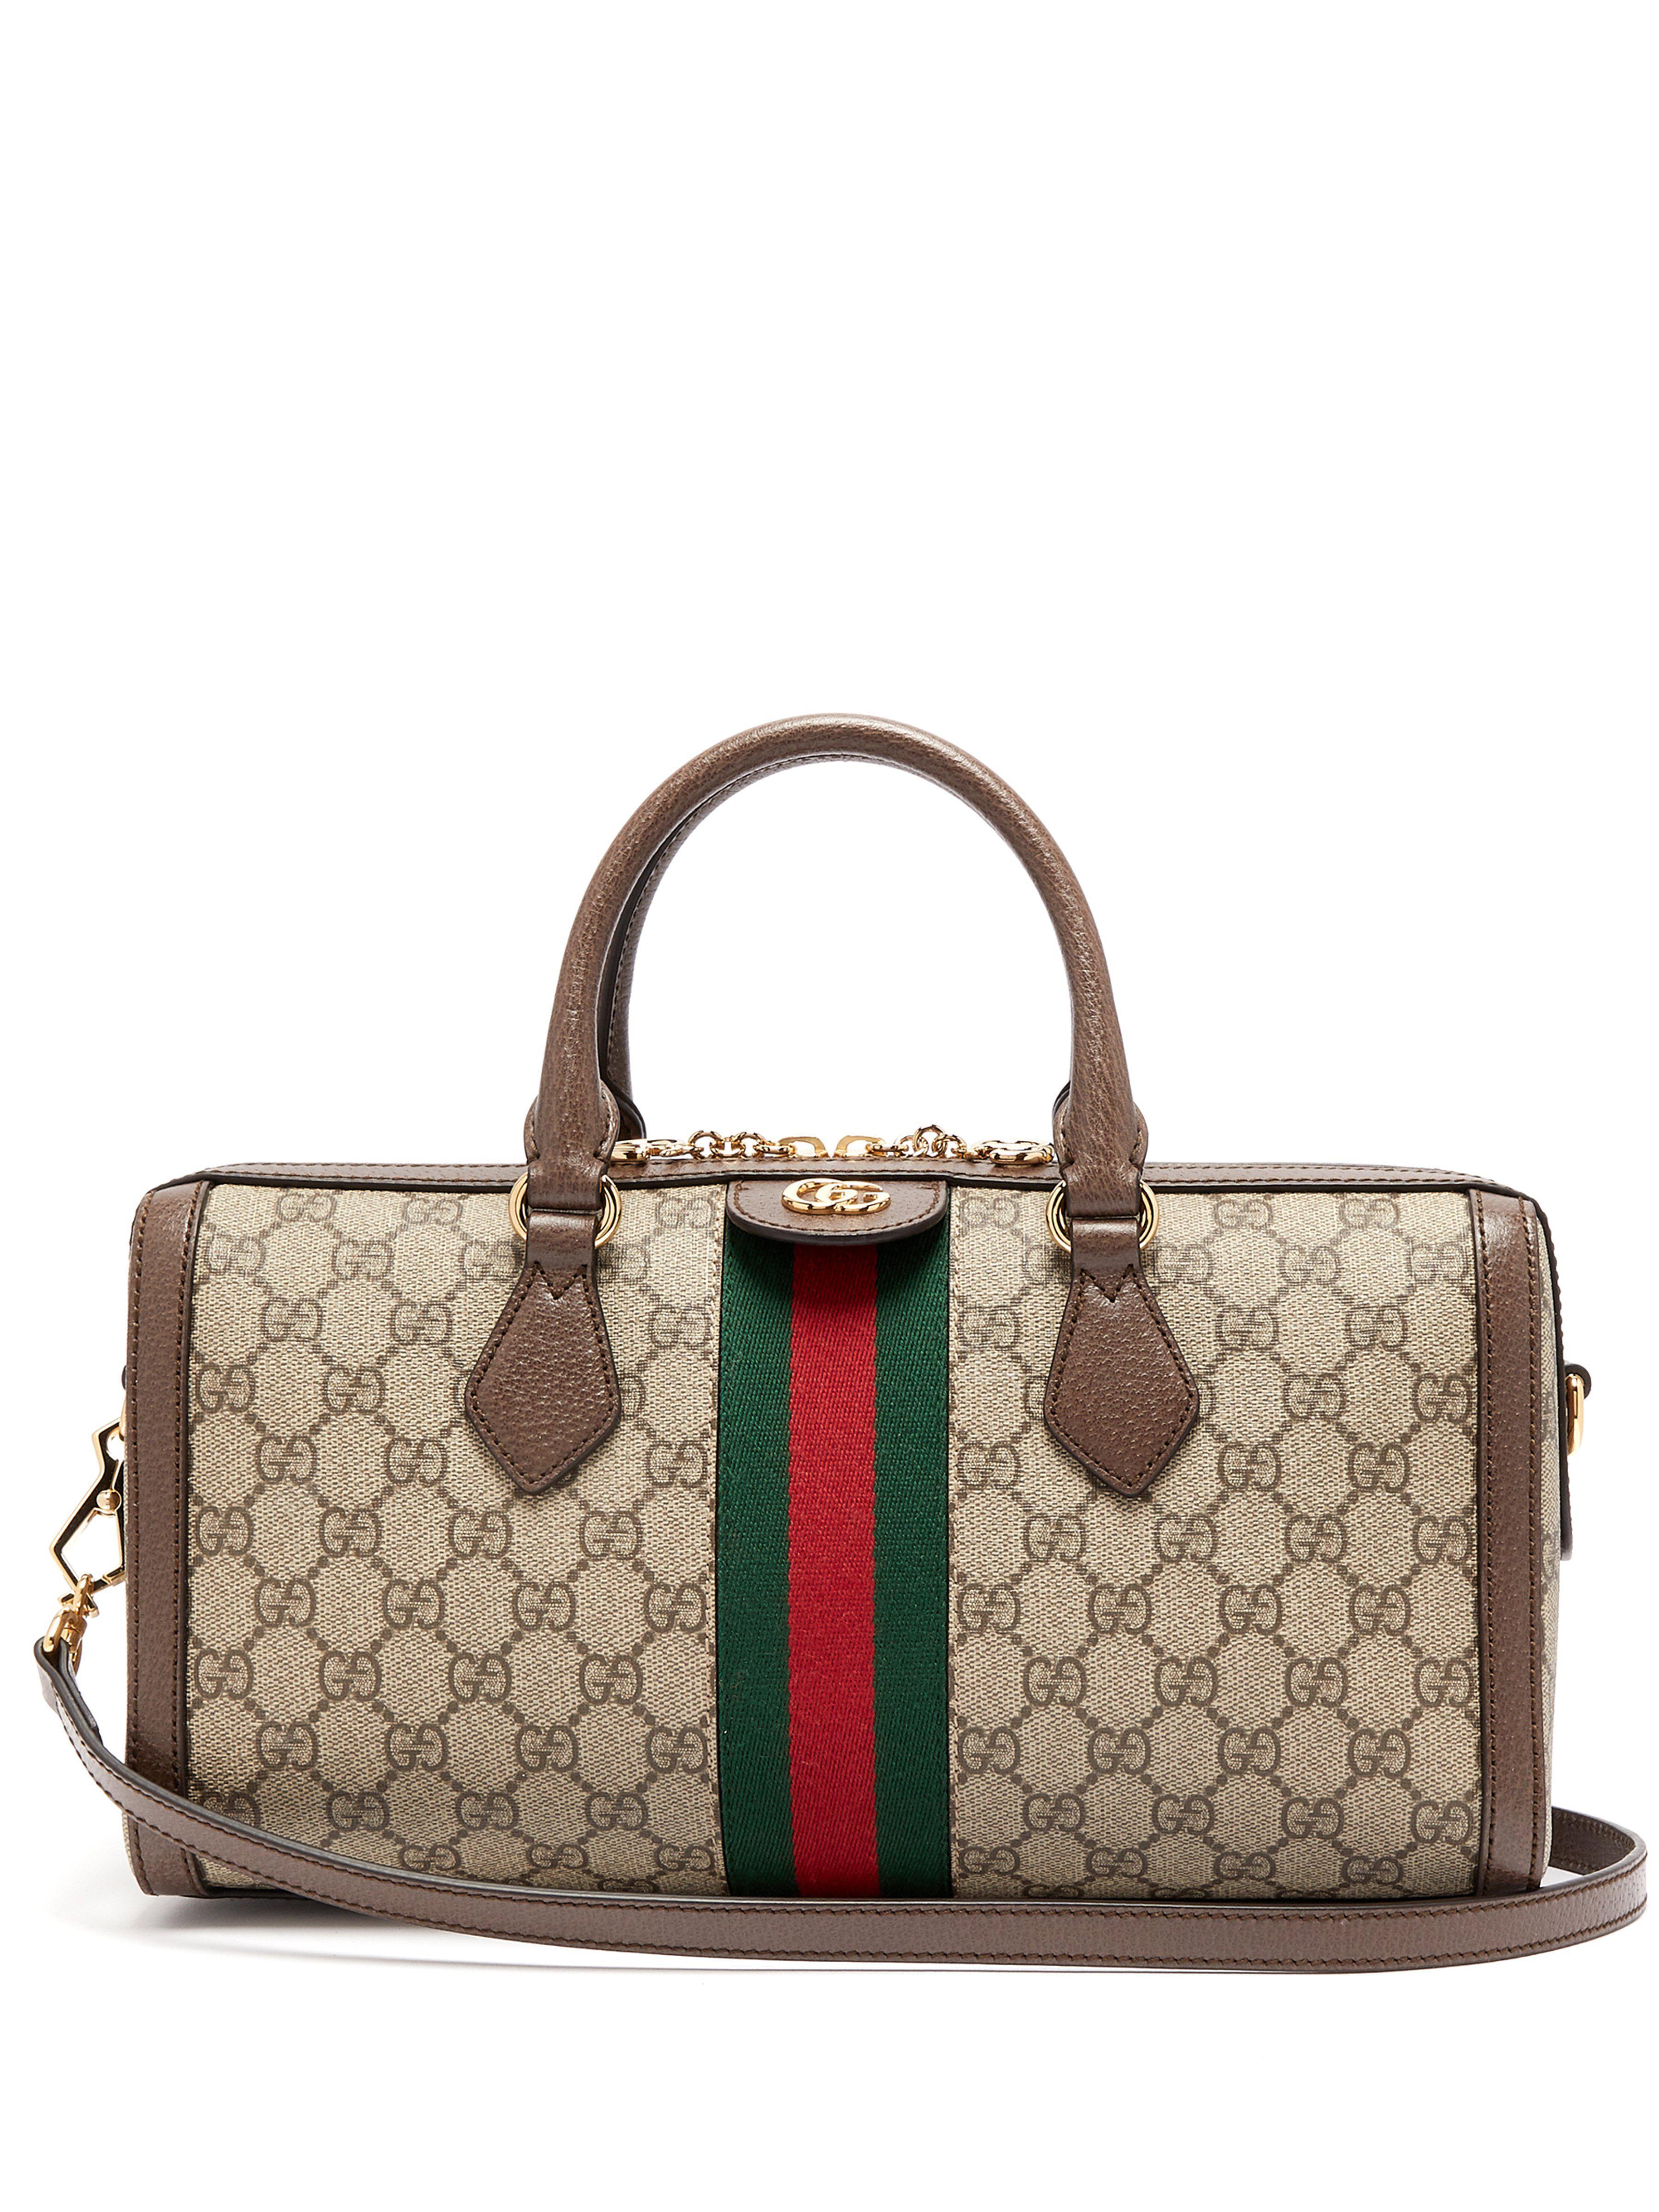 9ec27f79dcf874 Gucci. Women's Ophidia Boston Gg Supreme Bag